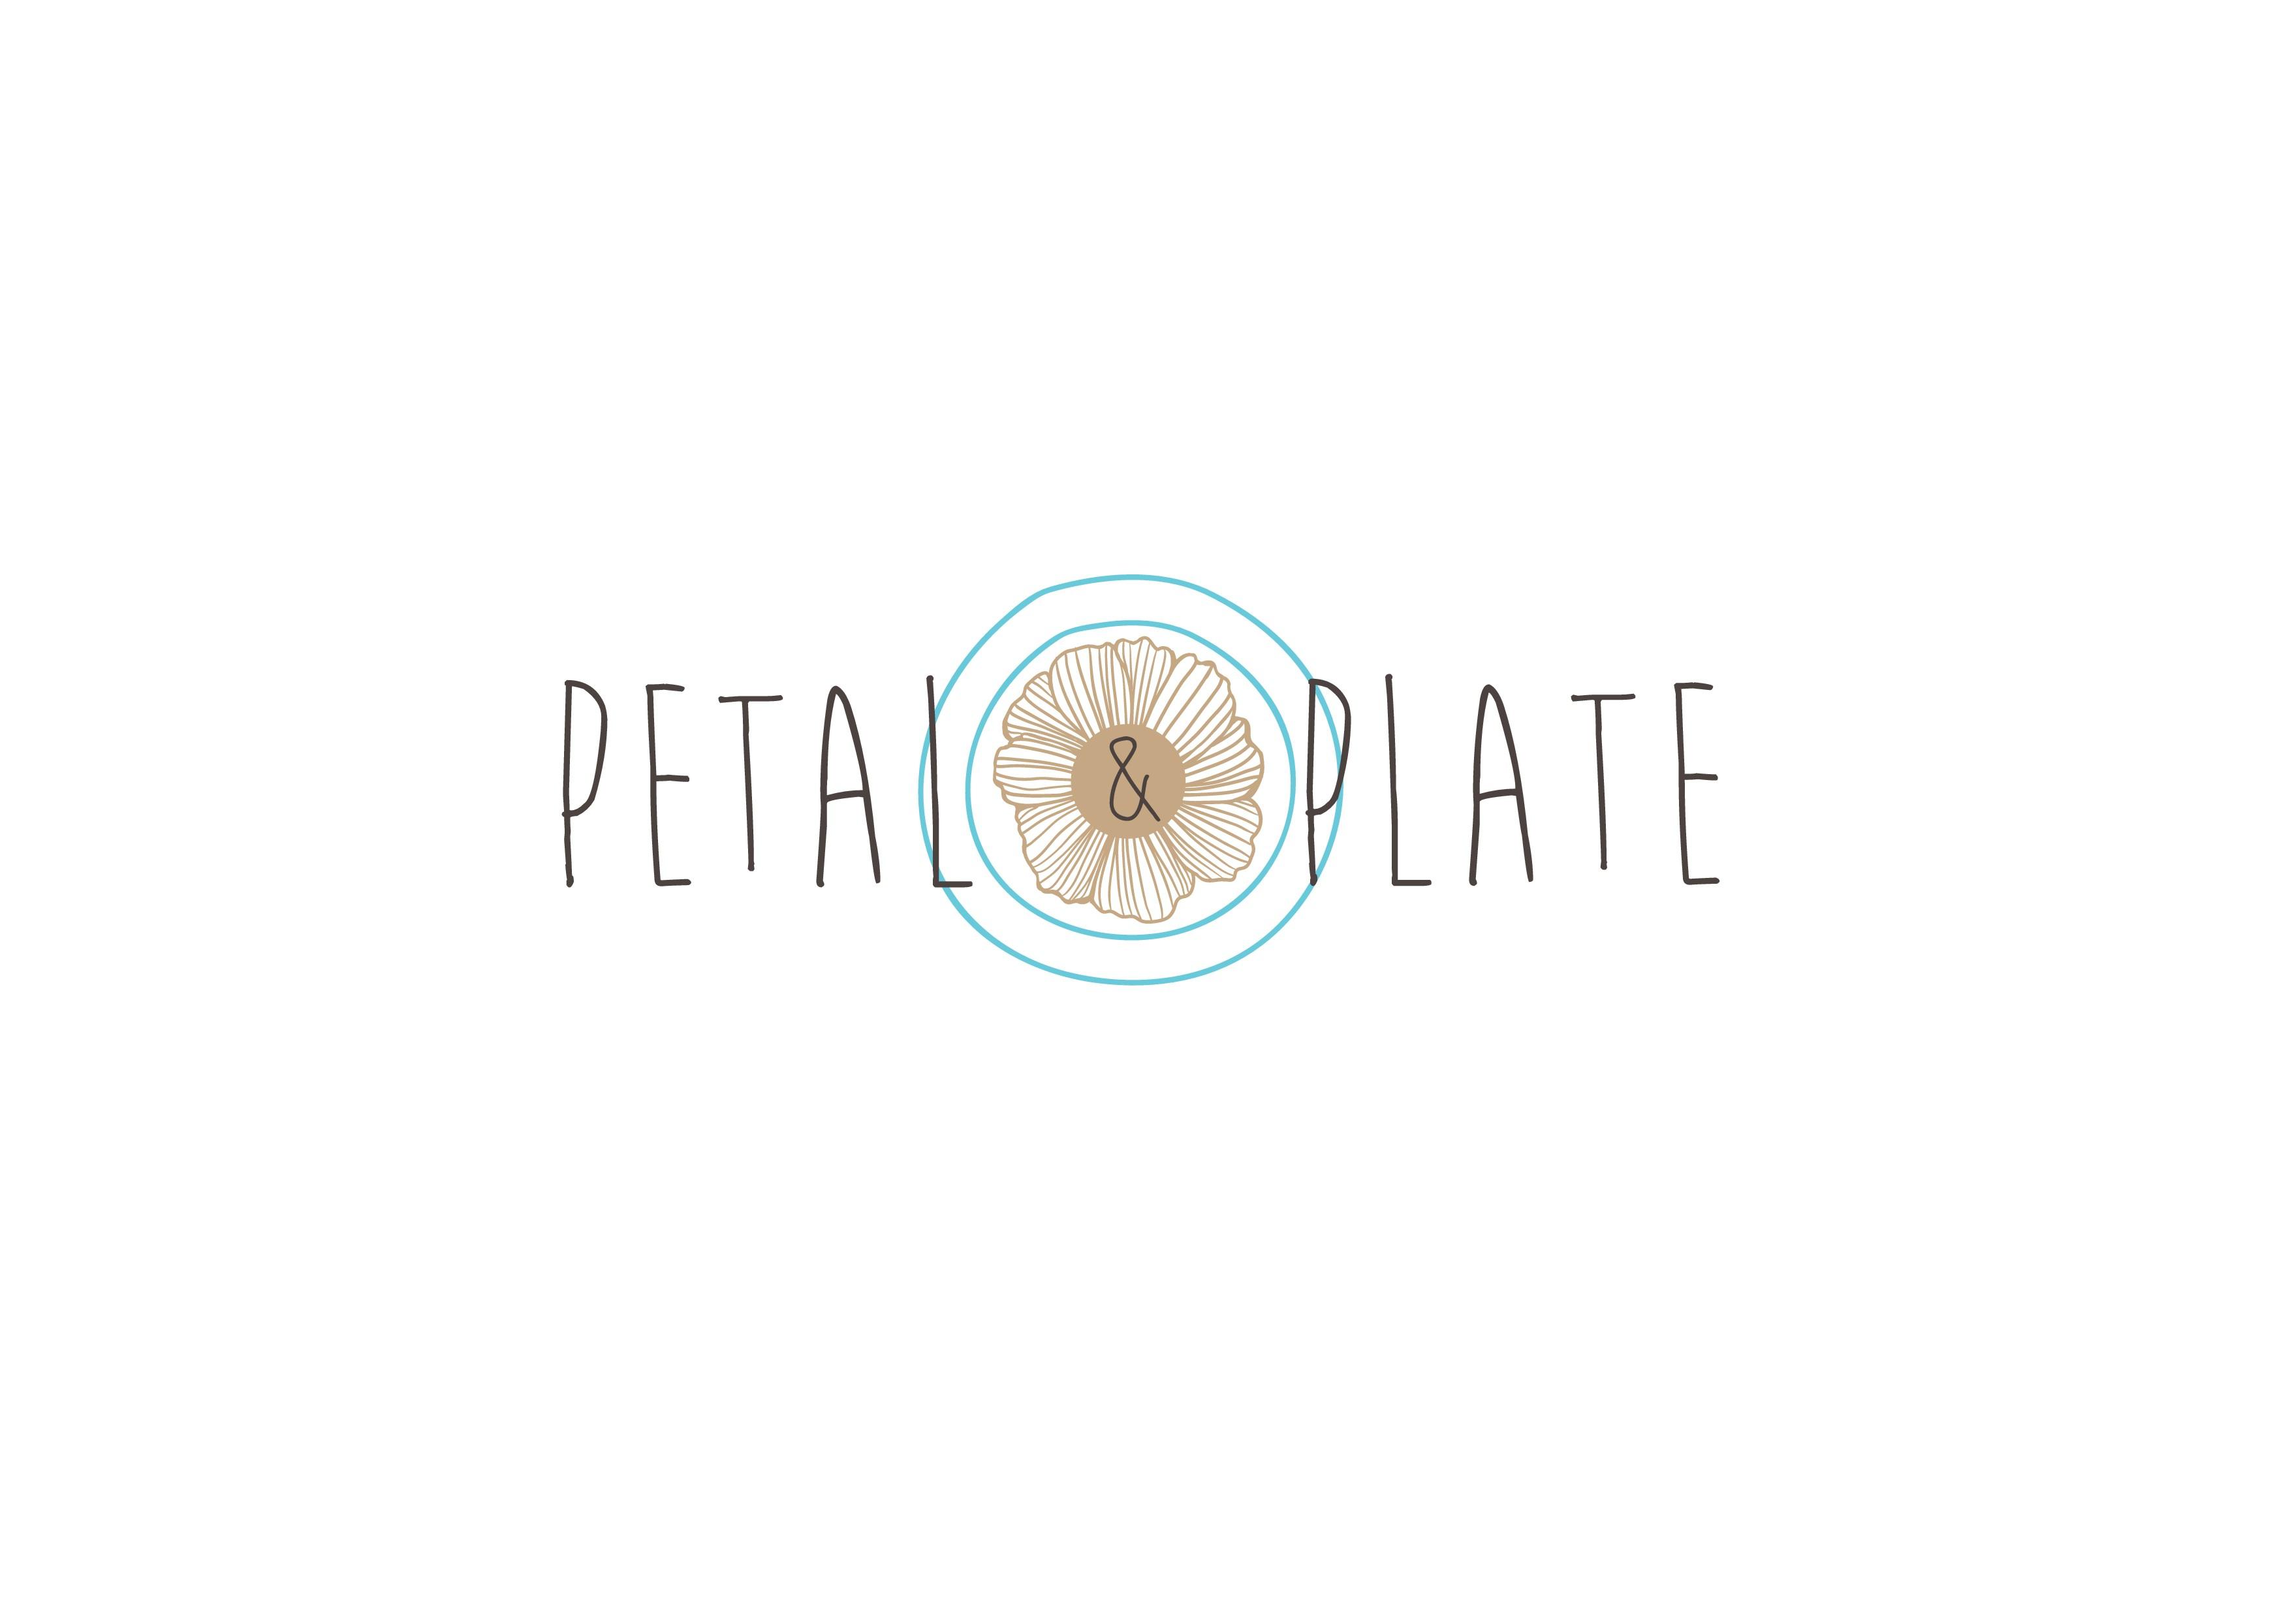 Petal & Plate needs a new look